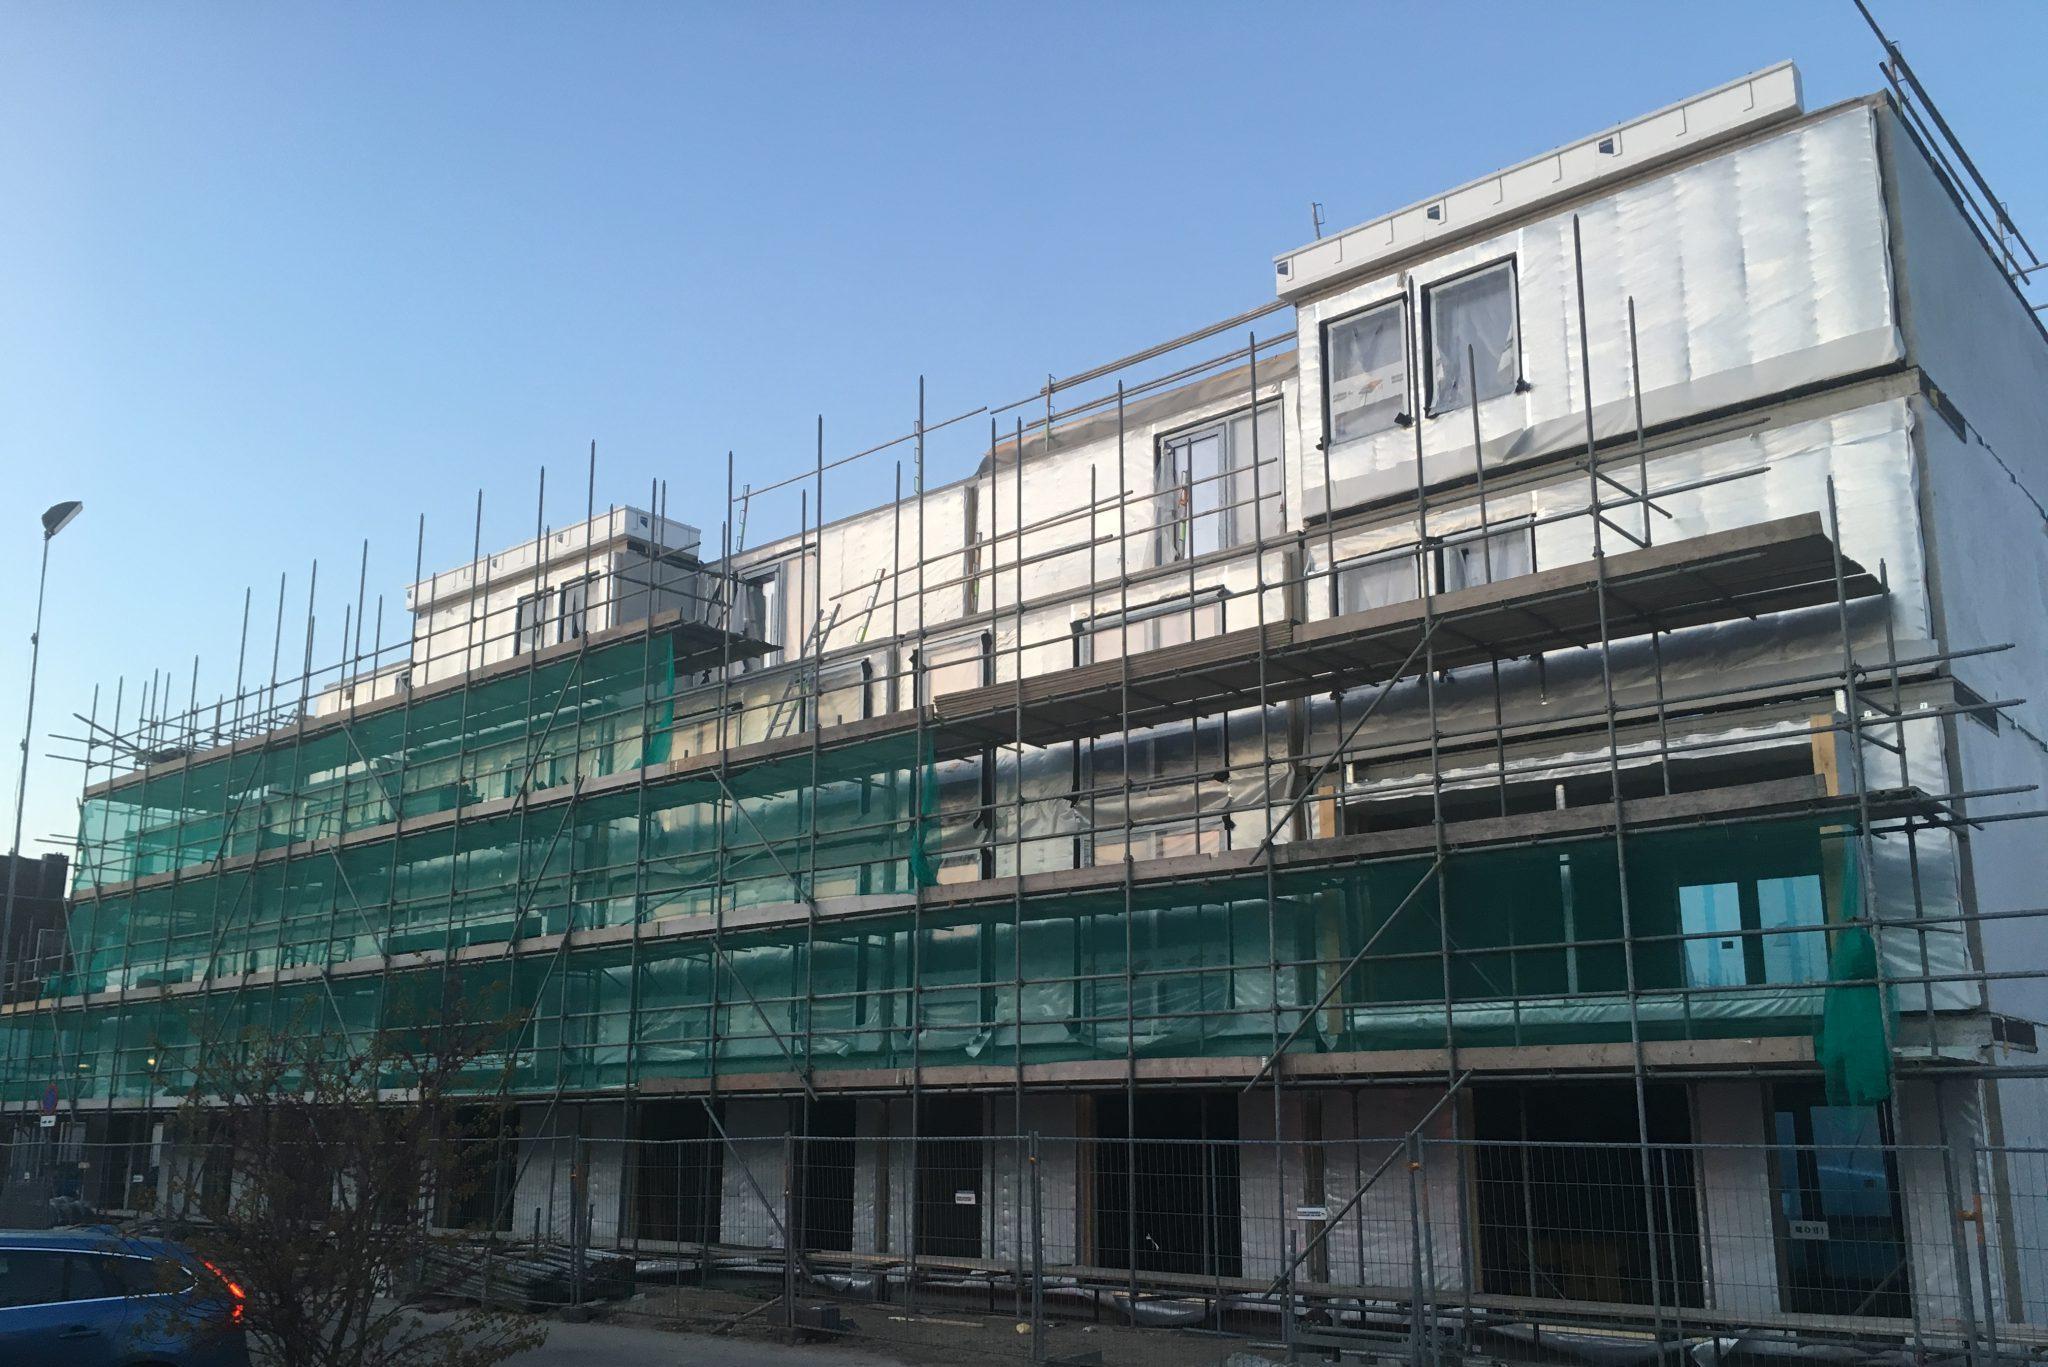 privatisering bouwtoezicht, kwaliteitsborging